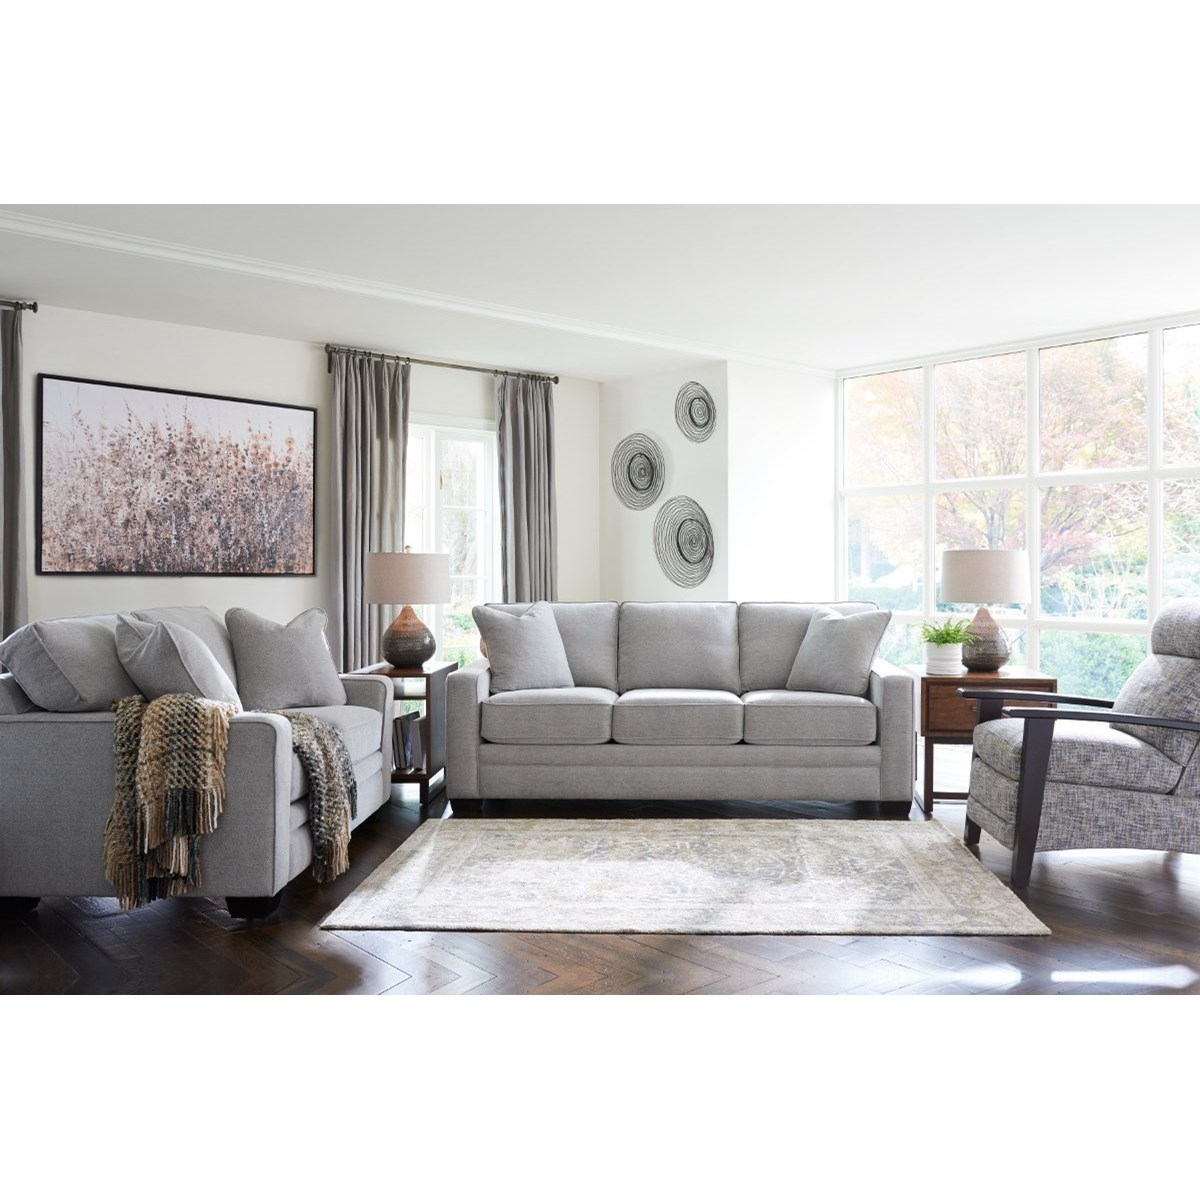 lazy boy living room formal with brick fireplace la z meyer group bennett s home furnishings